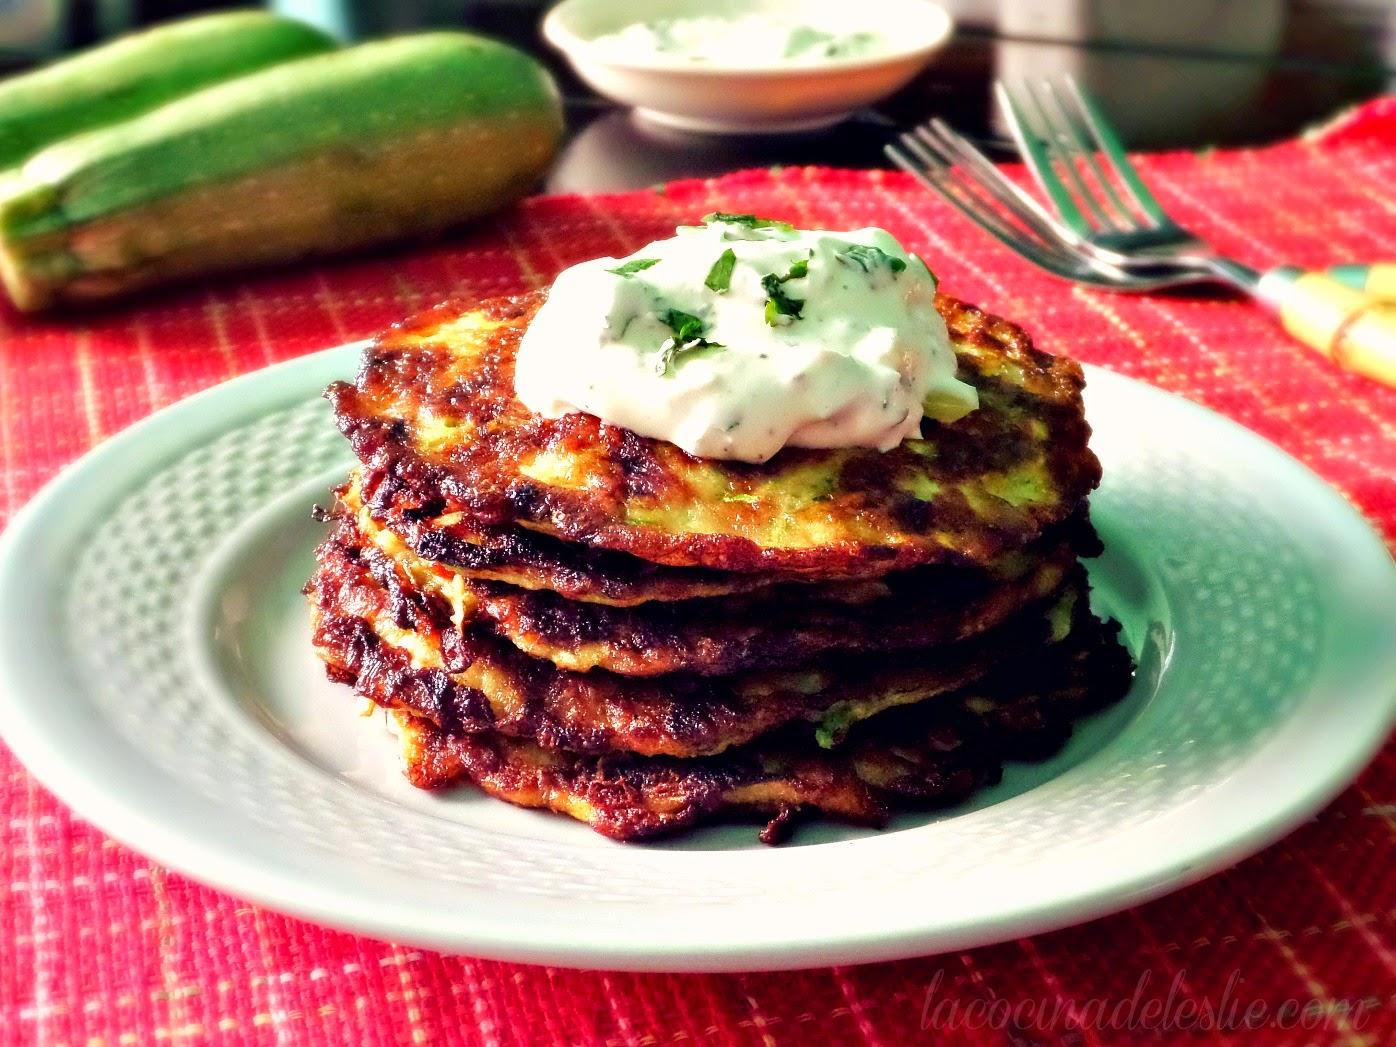 Tortitas de Calabacita (Zucchini Fritters) - lacocinadeleslie.com